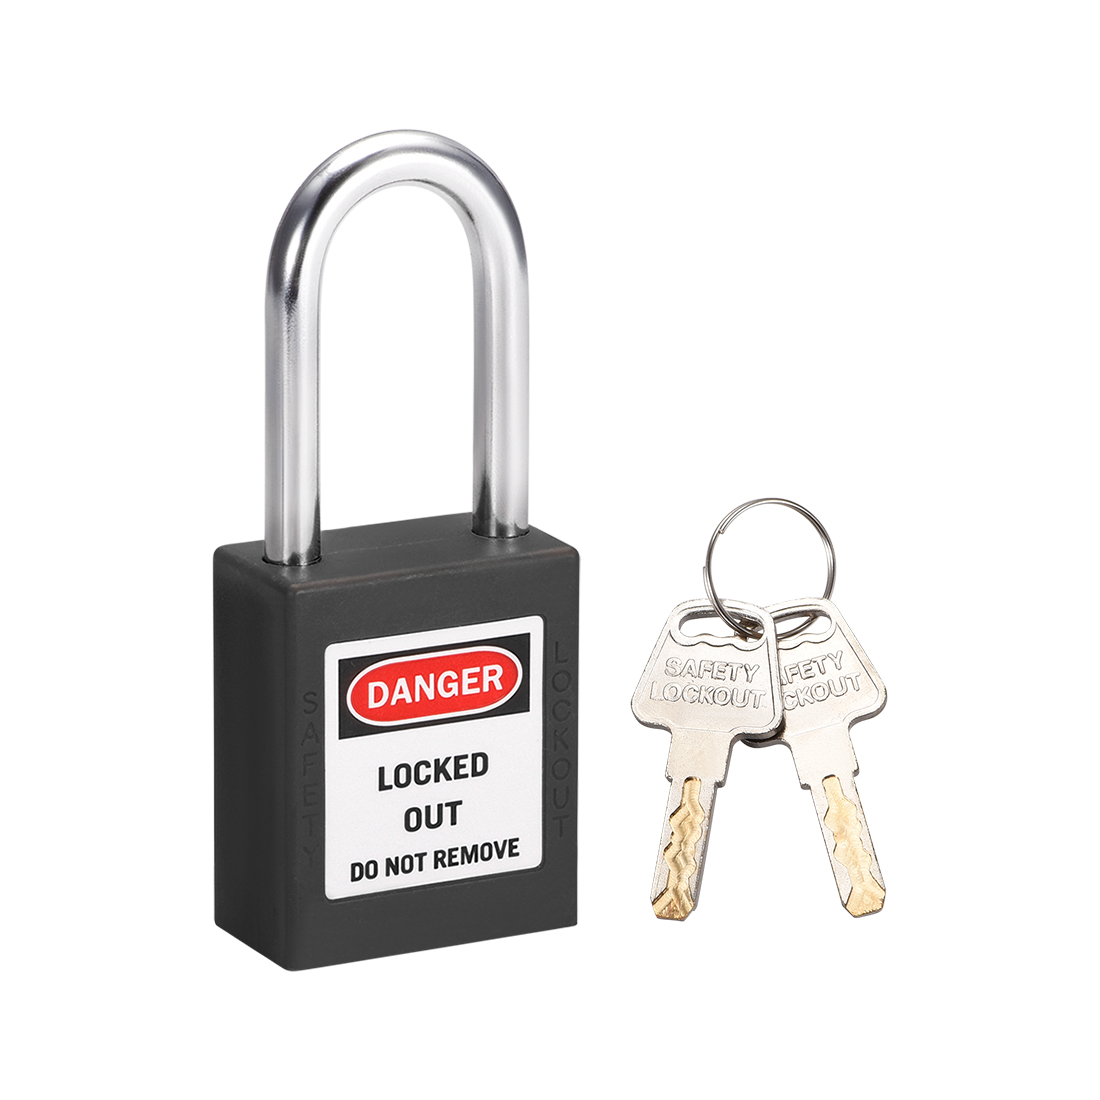 Lockout Tagout Locks 1-1/2 Inch Shackle Key Different Plastic Padlock Black